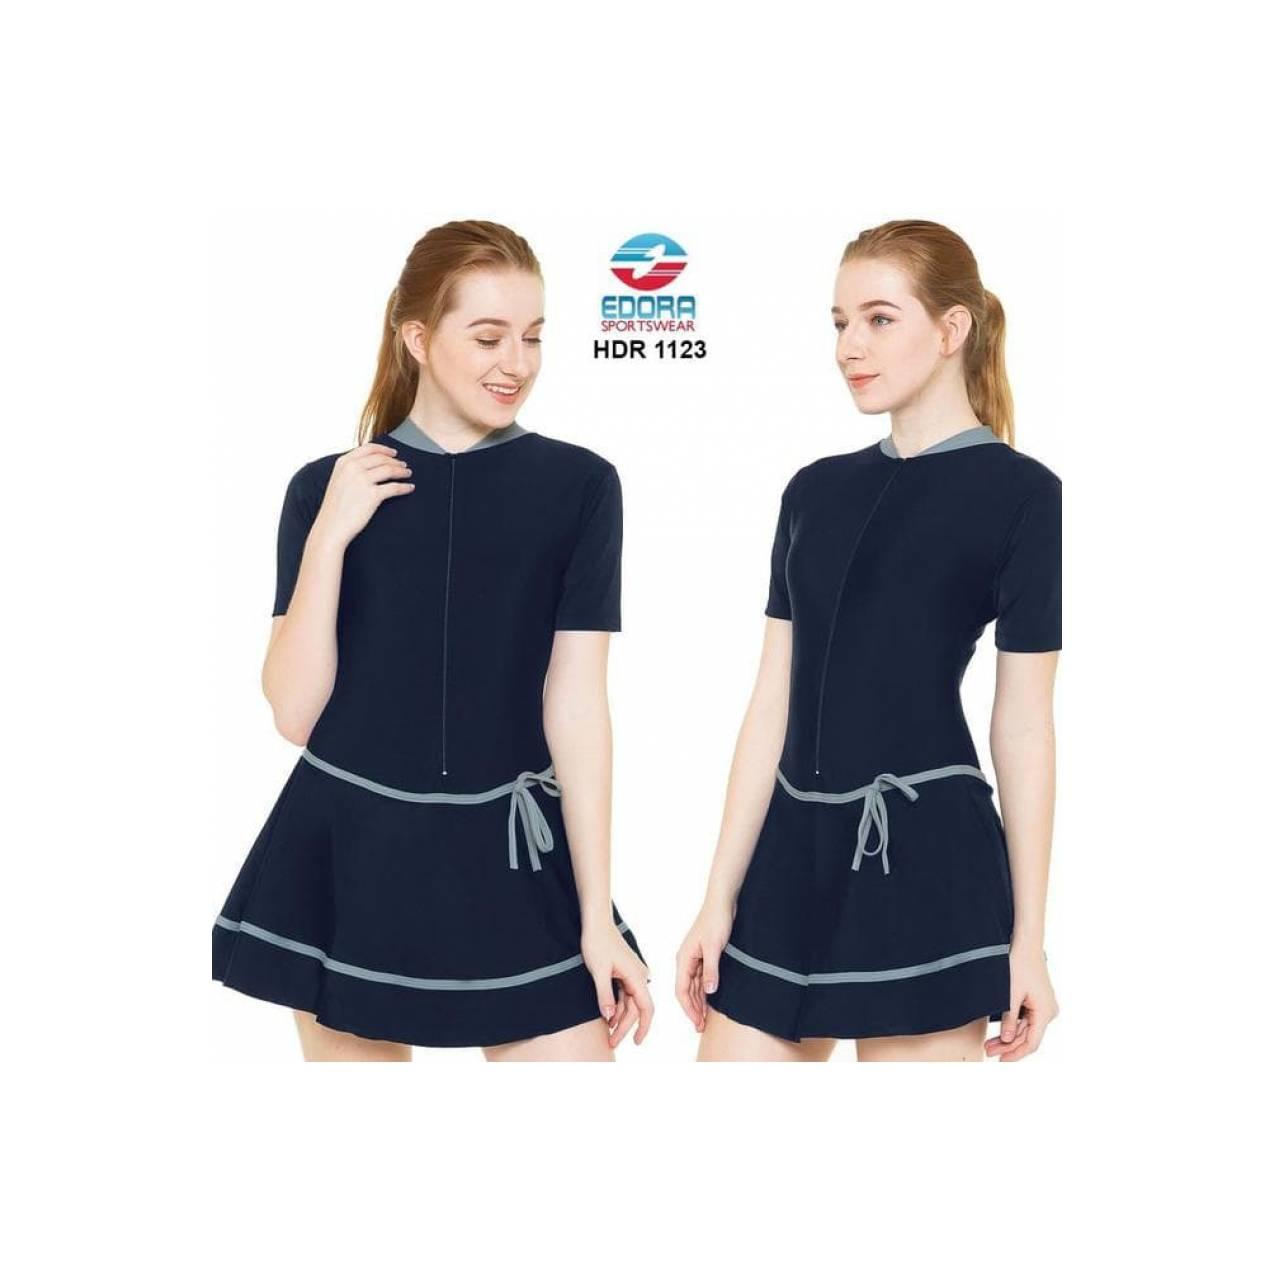 Jual Baju Renang Remaja Bb 70-80Kg (Xxl) Unik